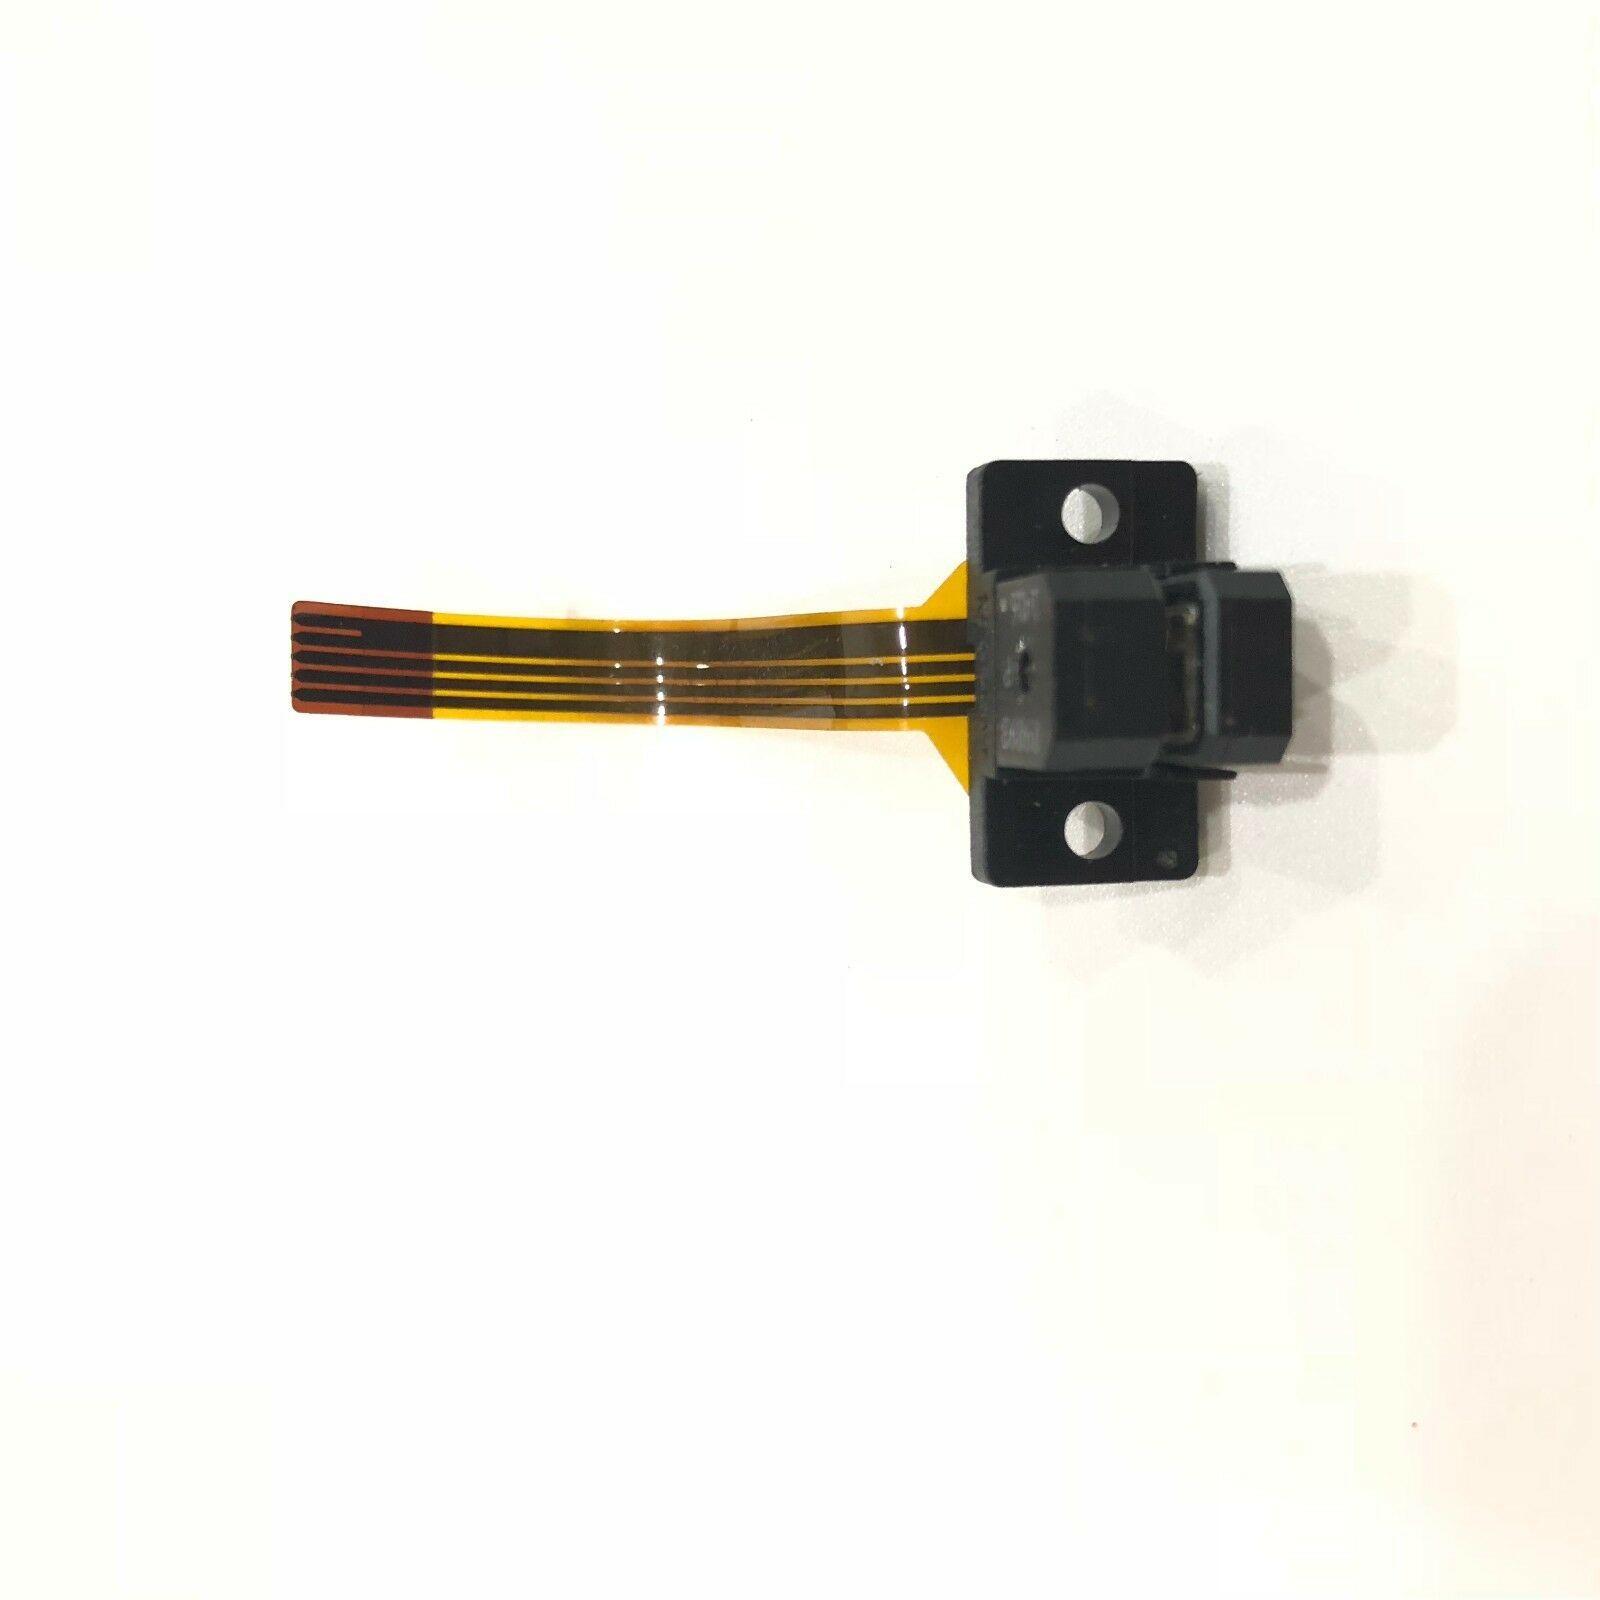 Q6651-60051 Encoder Strip sensor For HP DesignJet Z6200